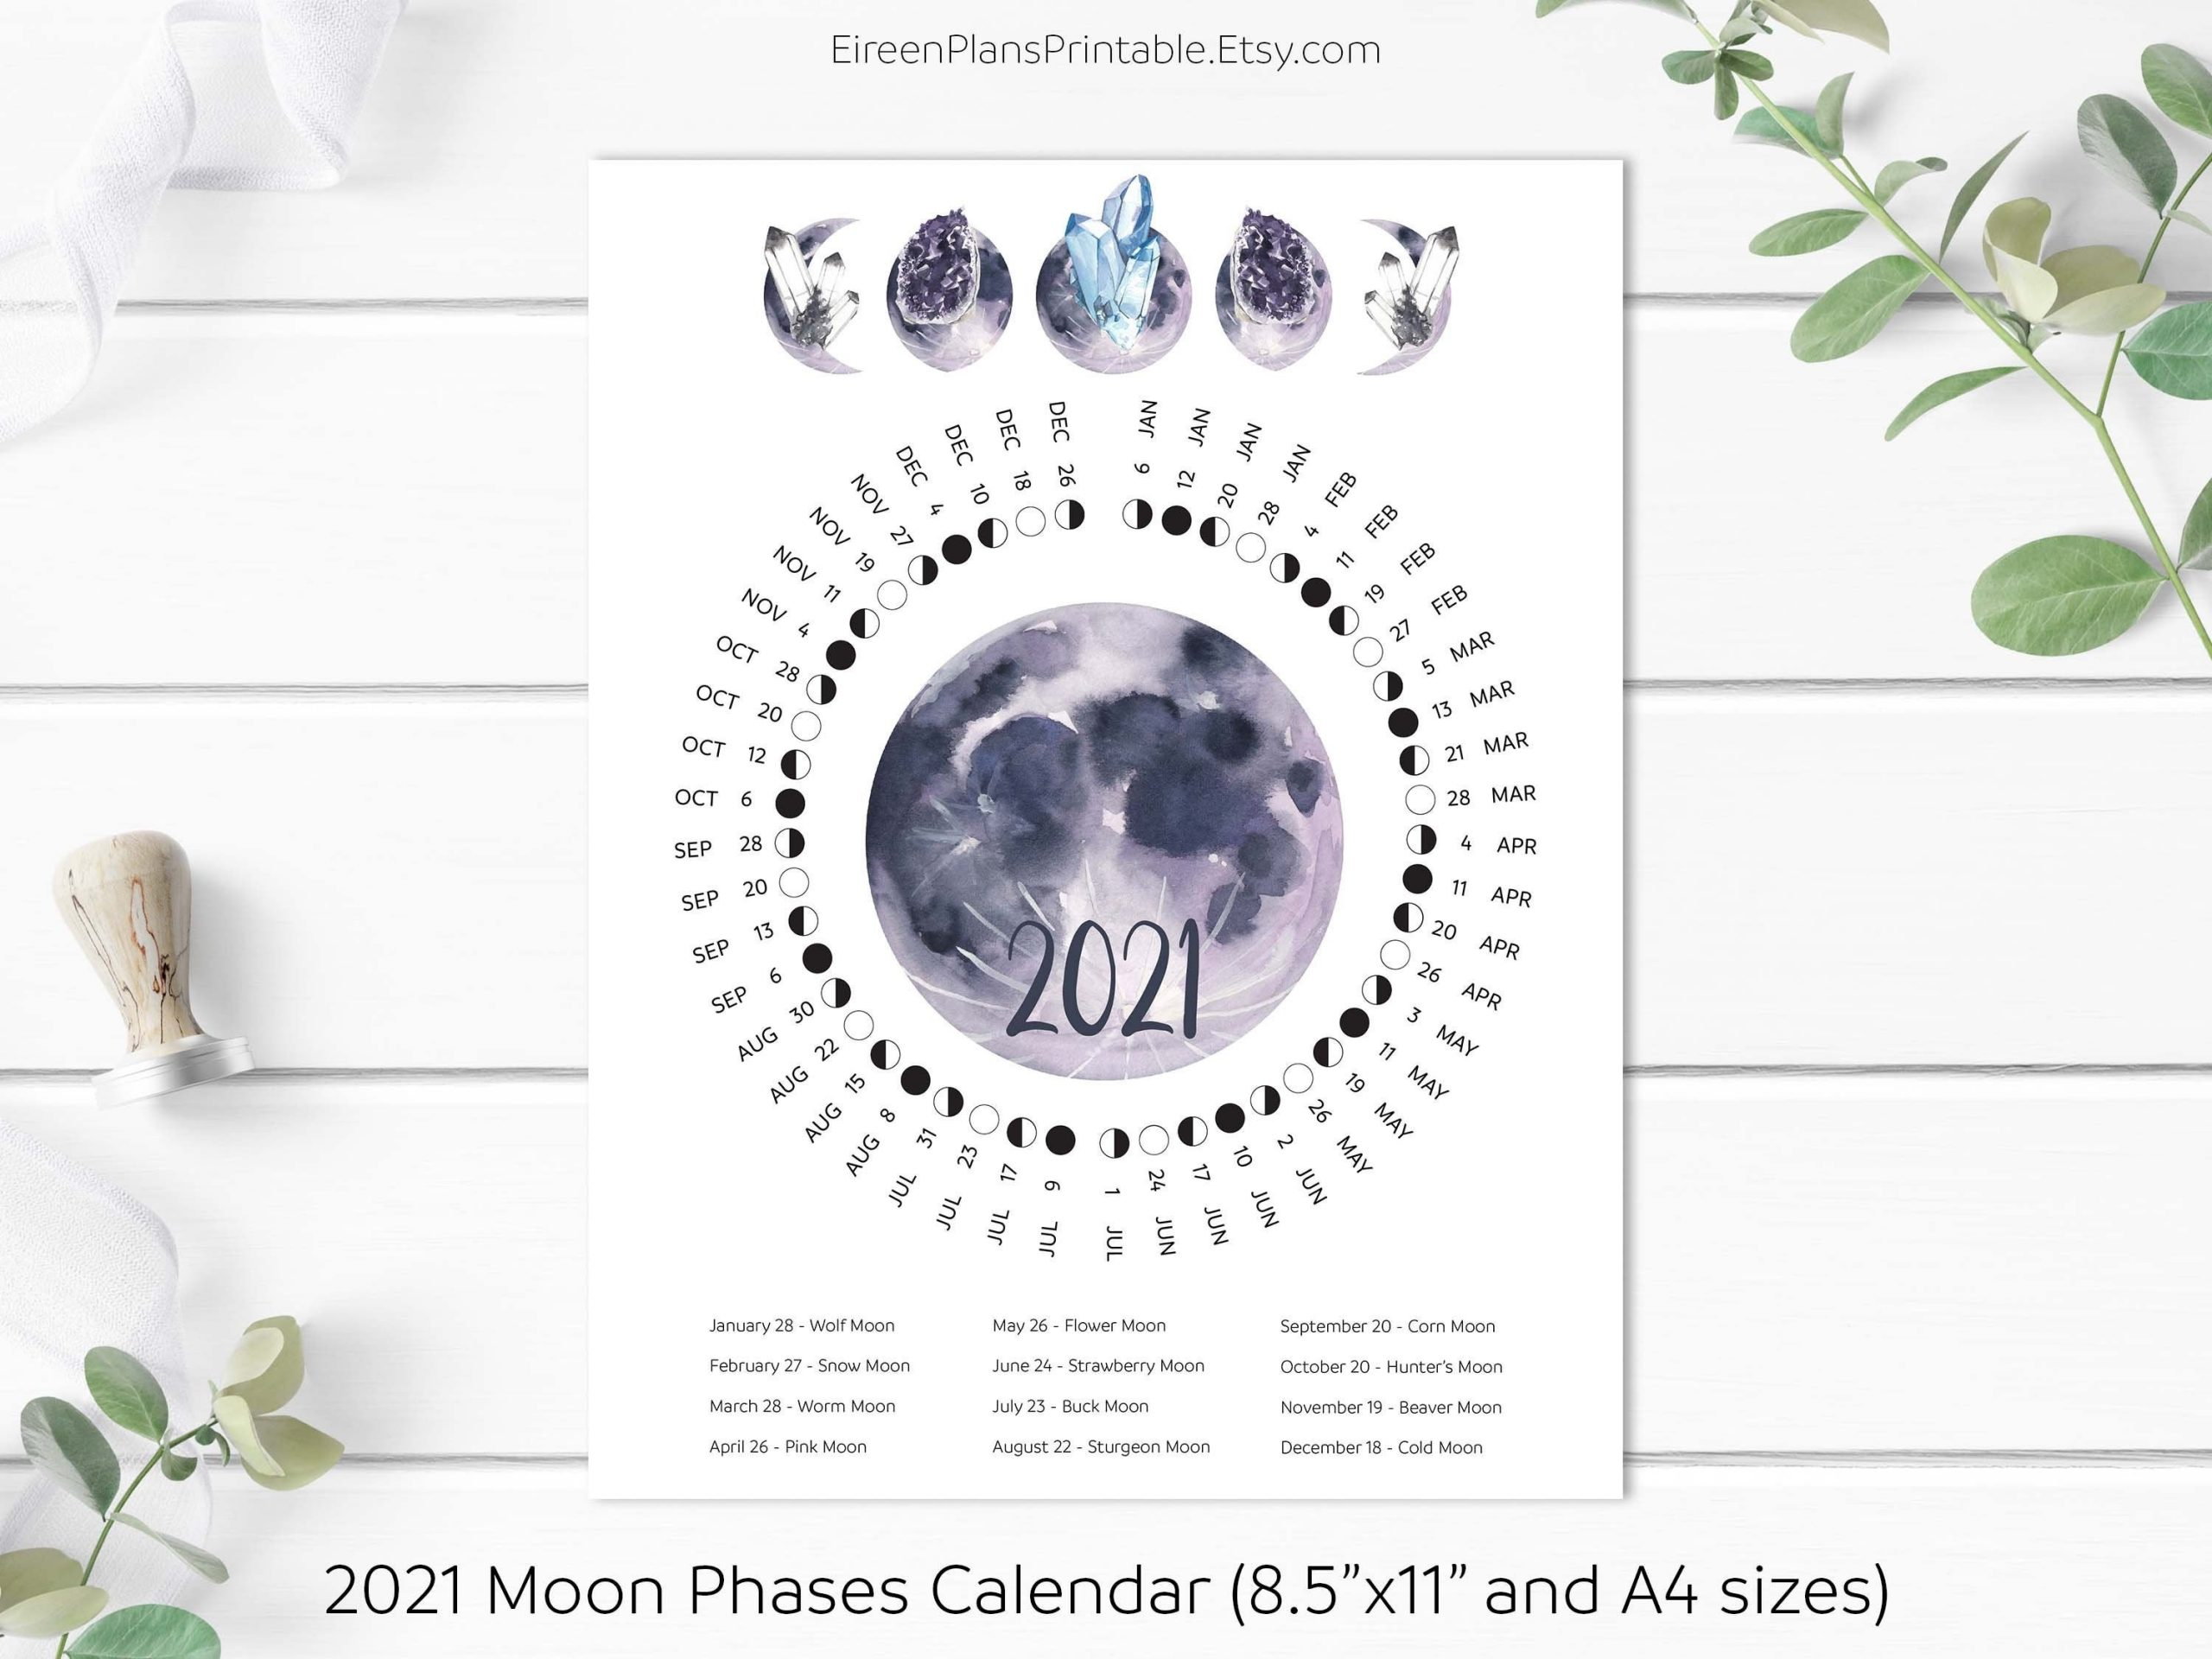 Printable 2021 Moon Phases Calendar 2021 Lunar Calendar Moon   Etsy inside Lunar Moon Calendar 2021